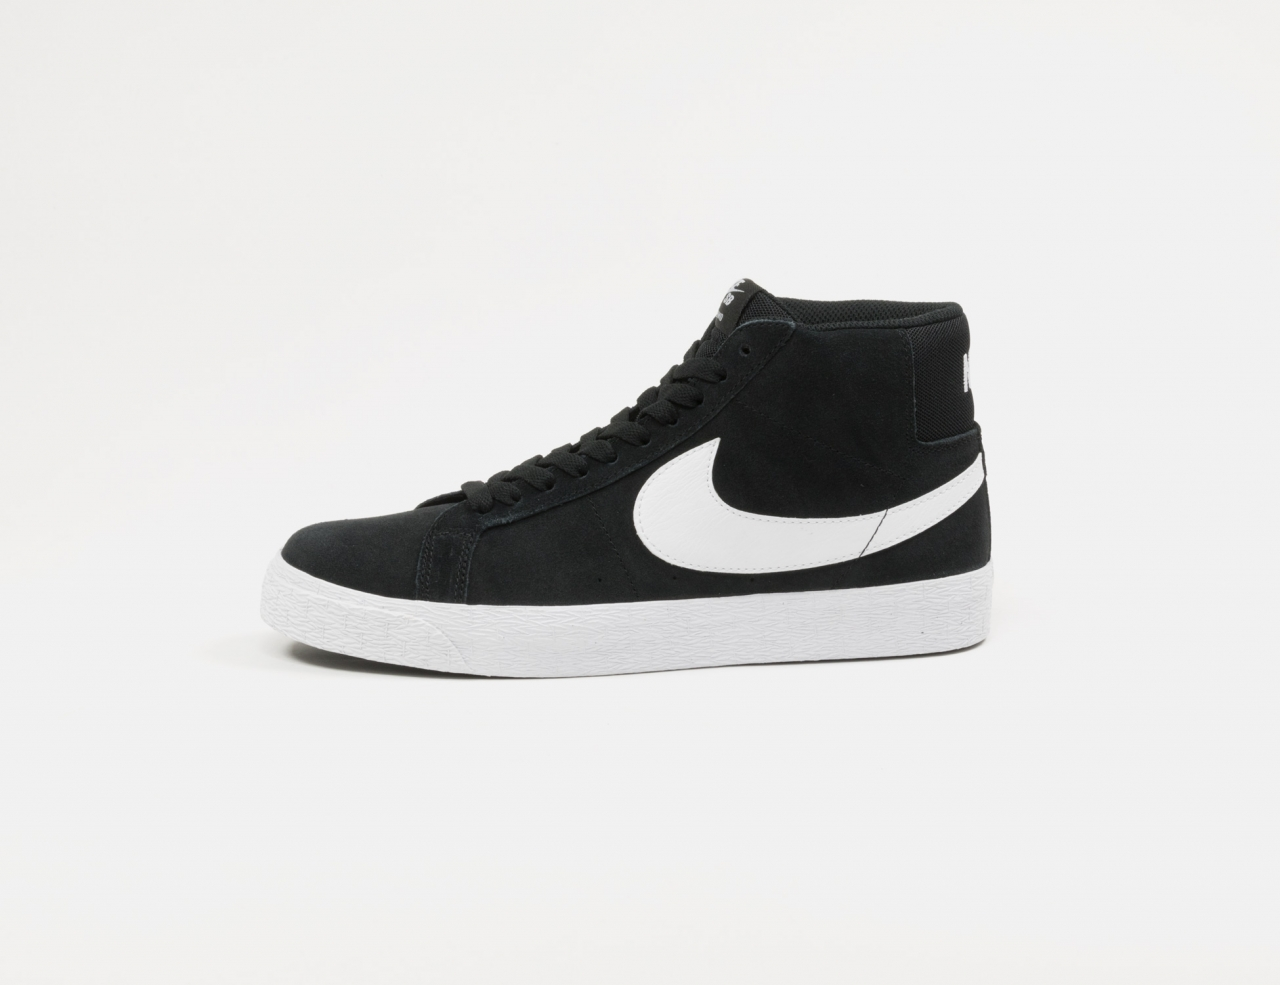 Nike SB Zoom Blazer Mid - Black/White